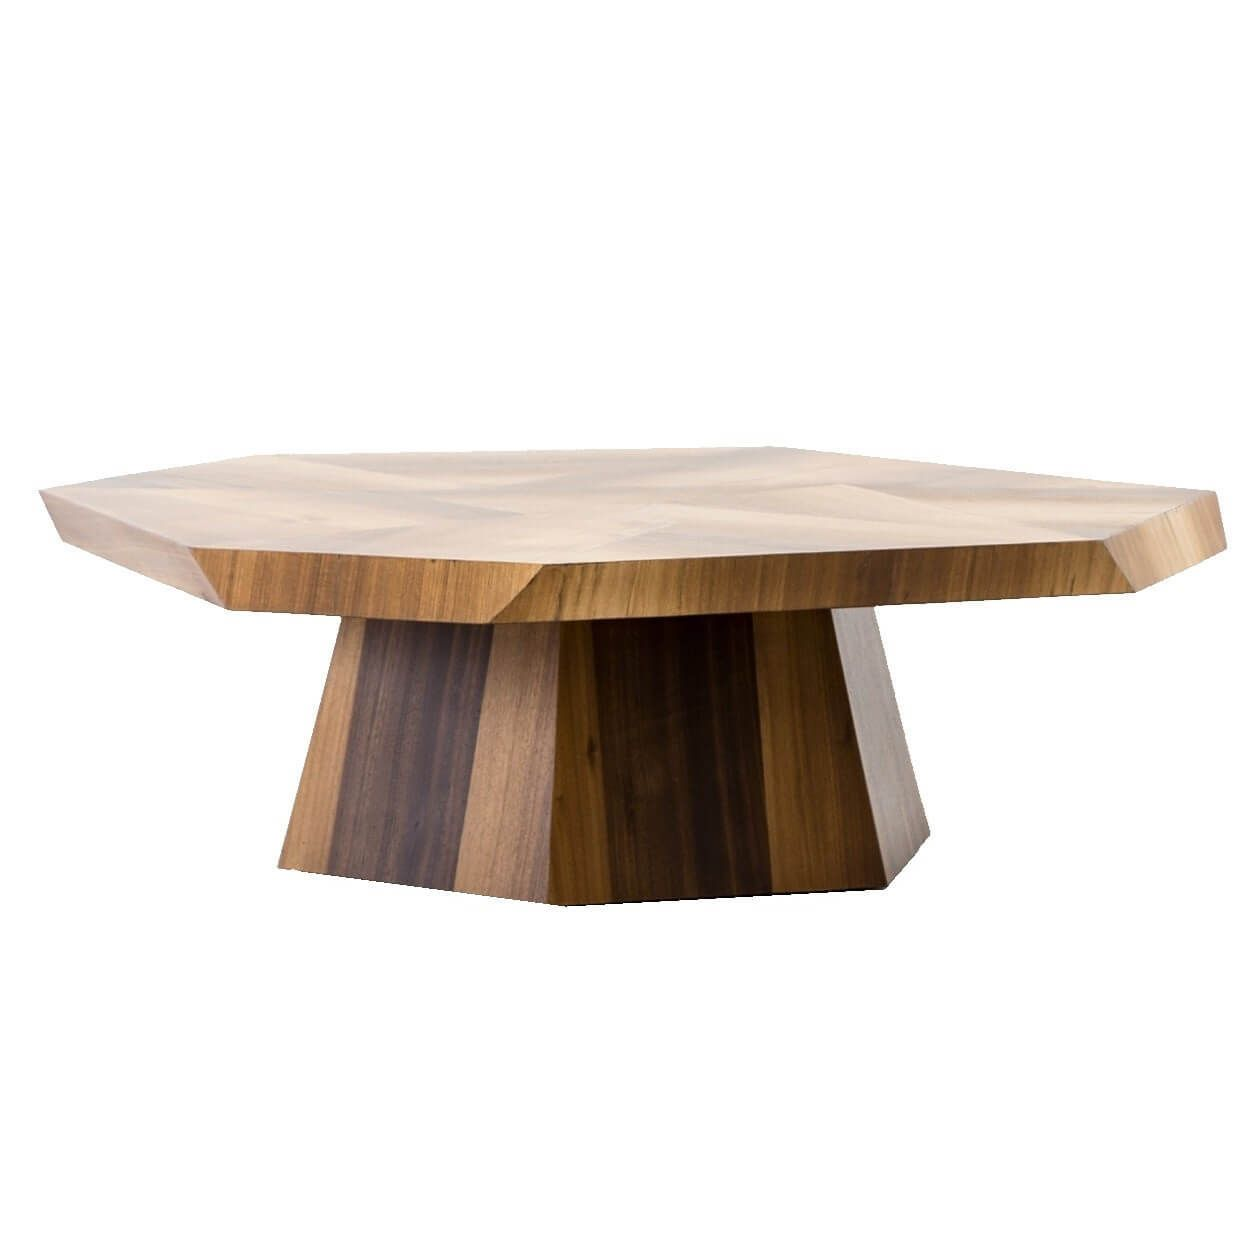 Brooklyn Organic Yukas Wood Octagon Coffee Table 53 In 2021 Coffee Table Bamboo Coffee Table Modern Wood Coffee Table [ 1260 x 1260 Pixel ]